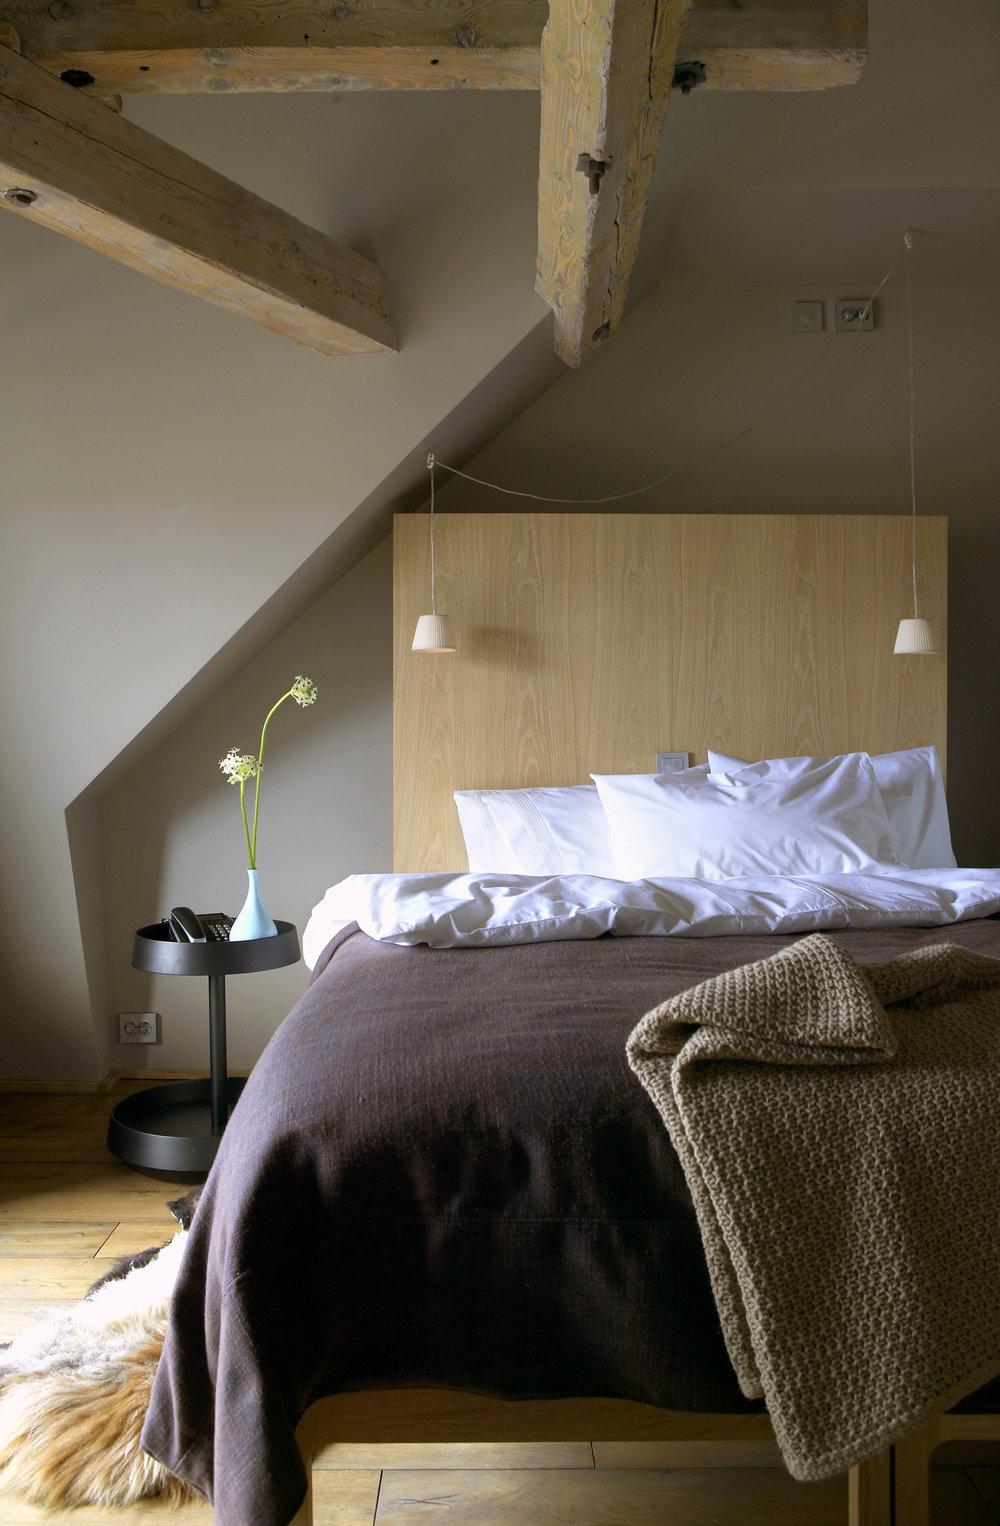 Hotel Brosundet Ålesund Norway, cosy hotel room with raw oak wood, interior design by GARDE. Mads Emil Garde